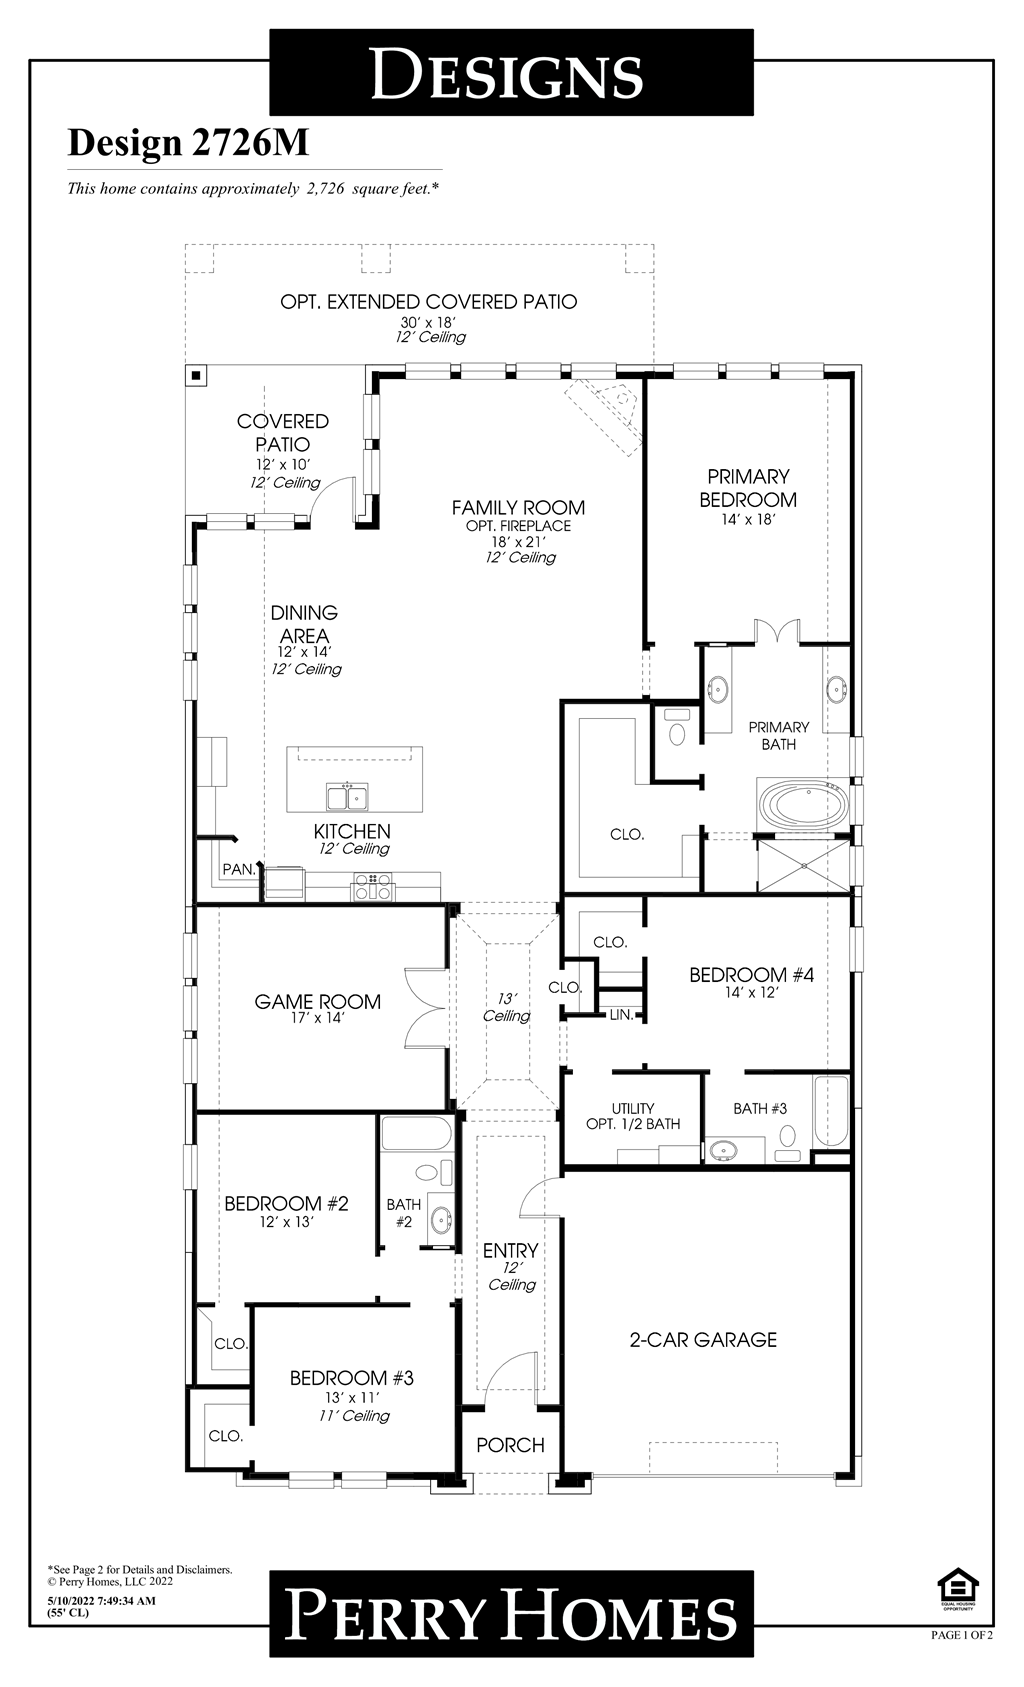 Floor Plan for 2726M